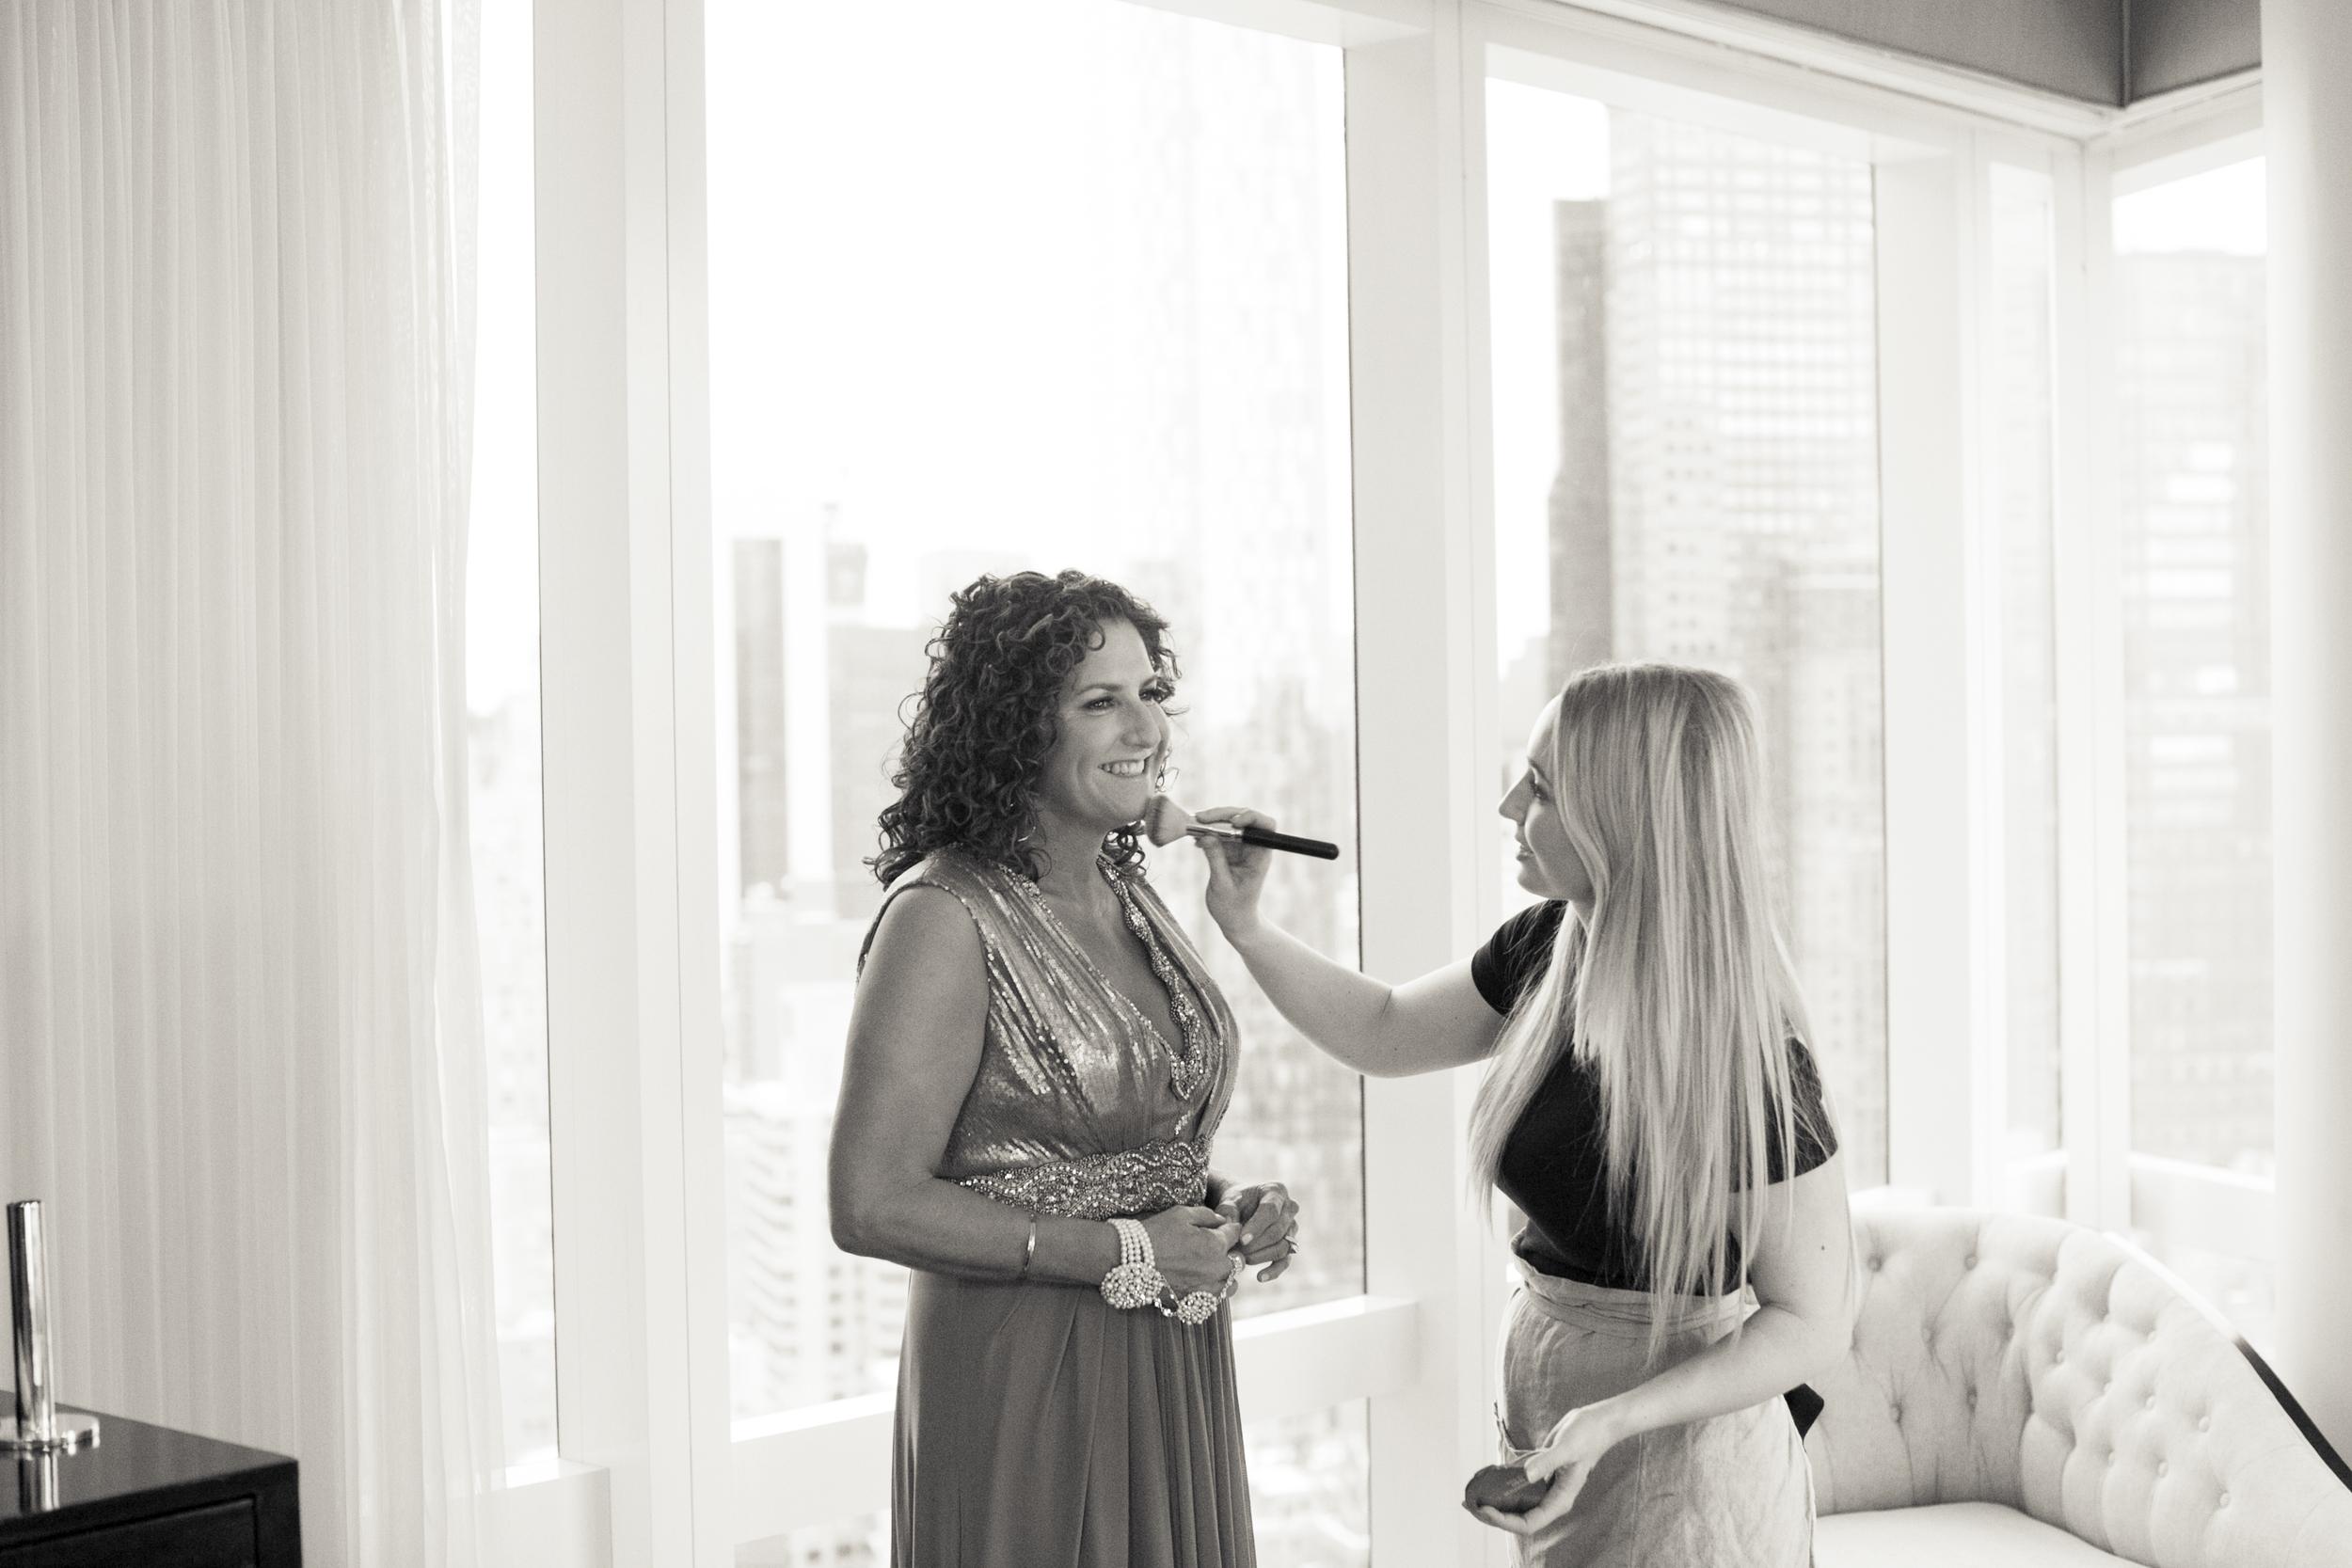 NYC-Wedding-Planner-Andrea-Freeman-Events-Mandarin-Oriental-4.jpg